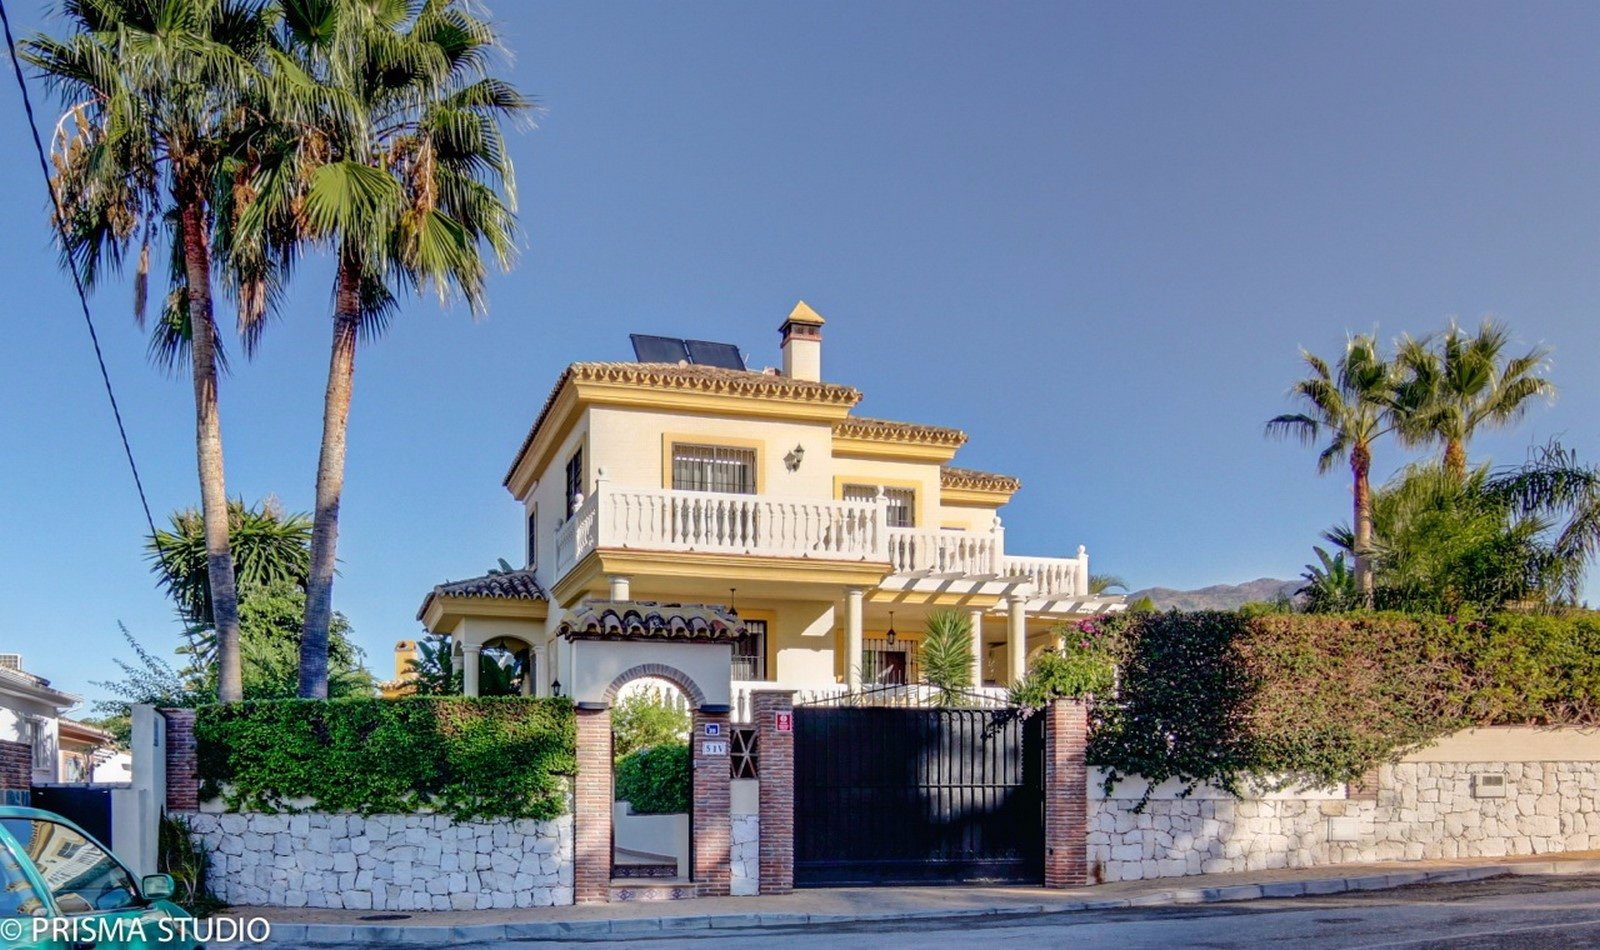 aaa4 bedroom Villa in Las Lagunas de Mijas, Mijas | M359059